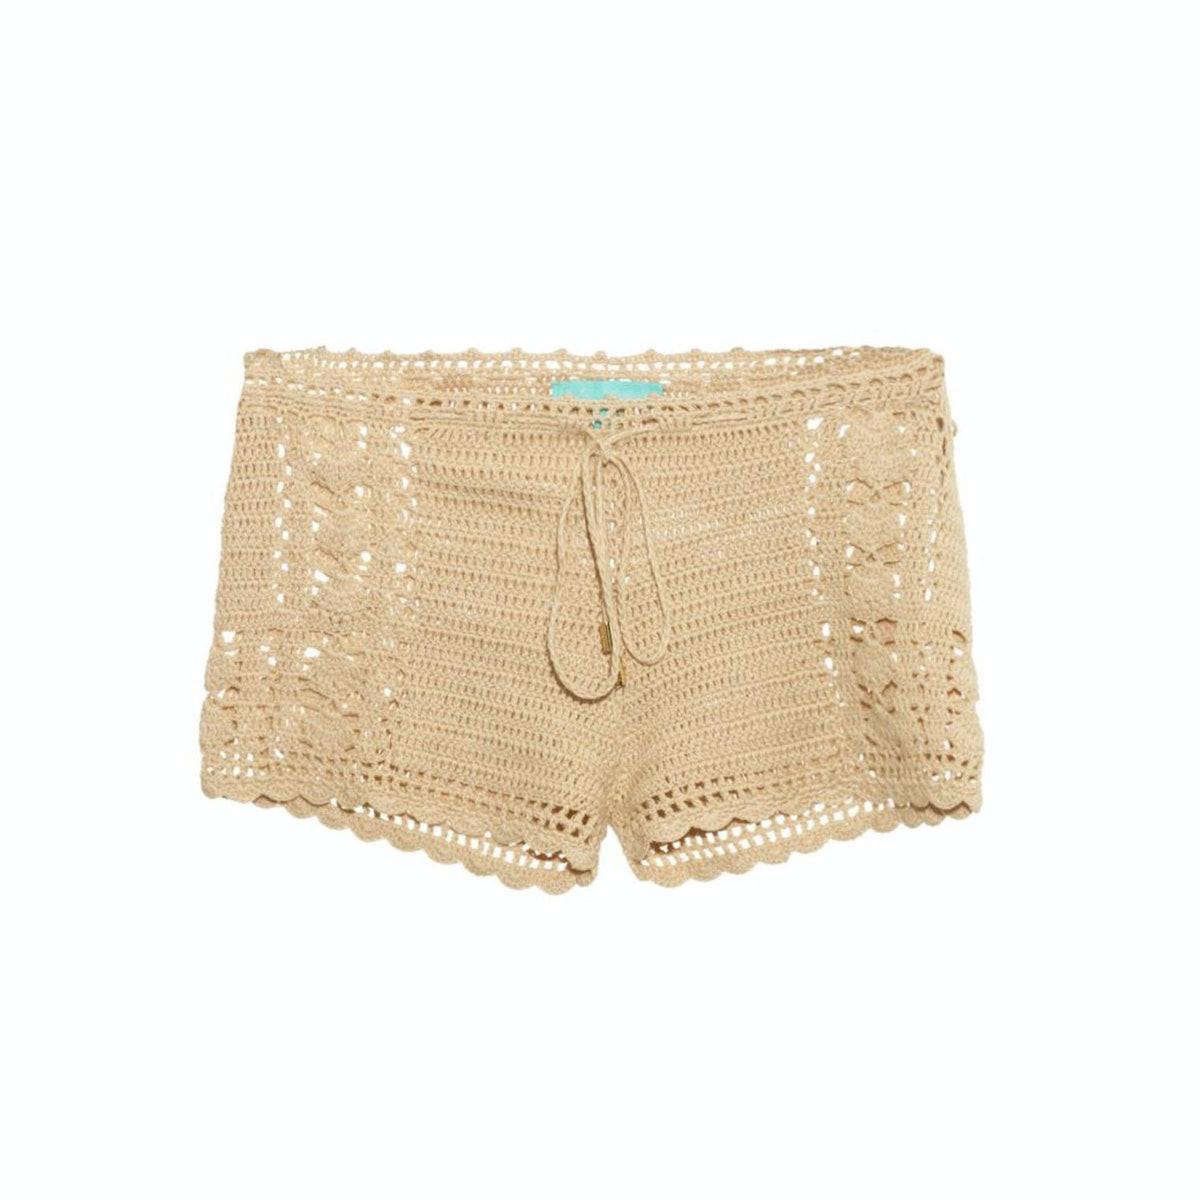 Melissa Obadash shorts